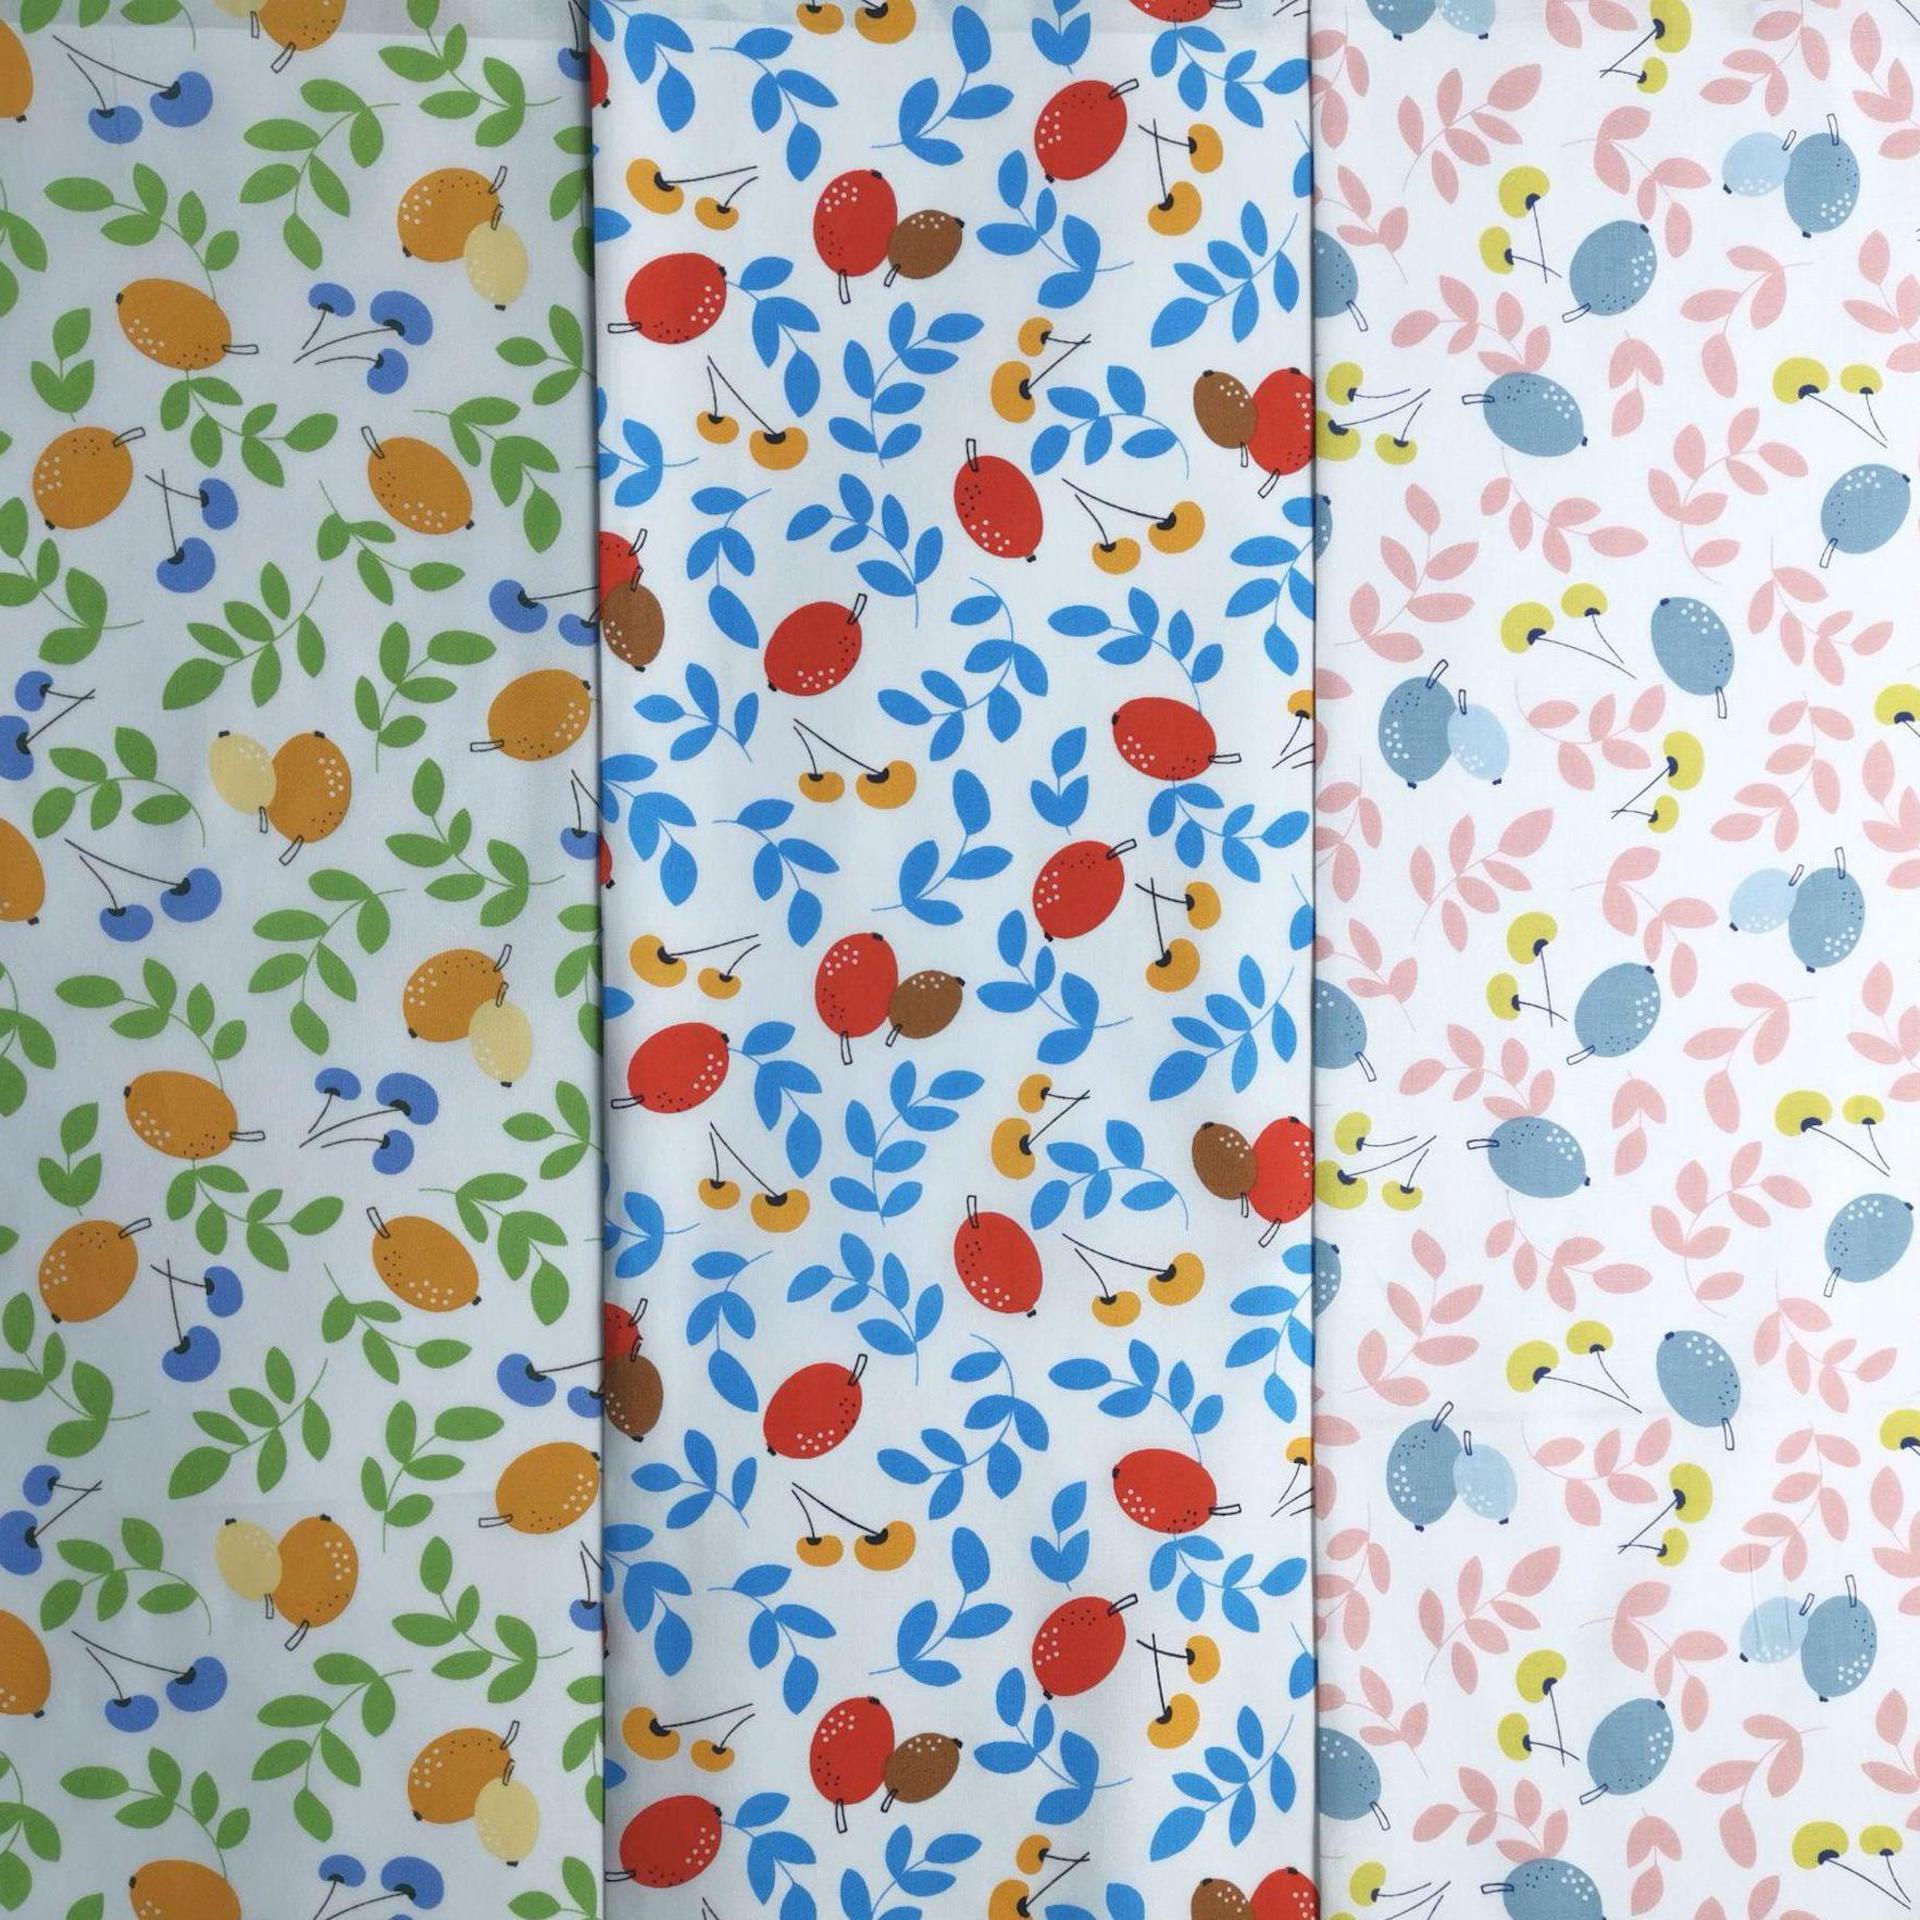 Hot sale flower pattern 60 cotton high density poplin imitation Tencel printed pure cotton printed fabric for dress